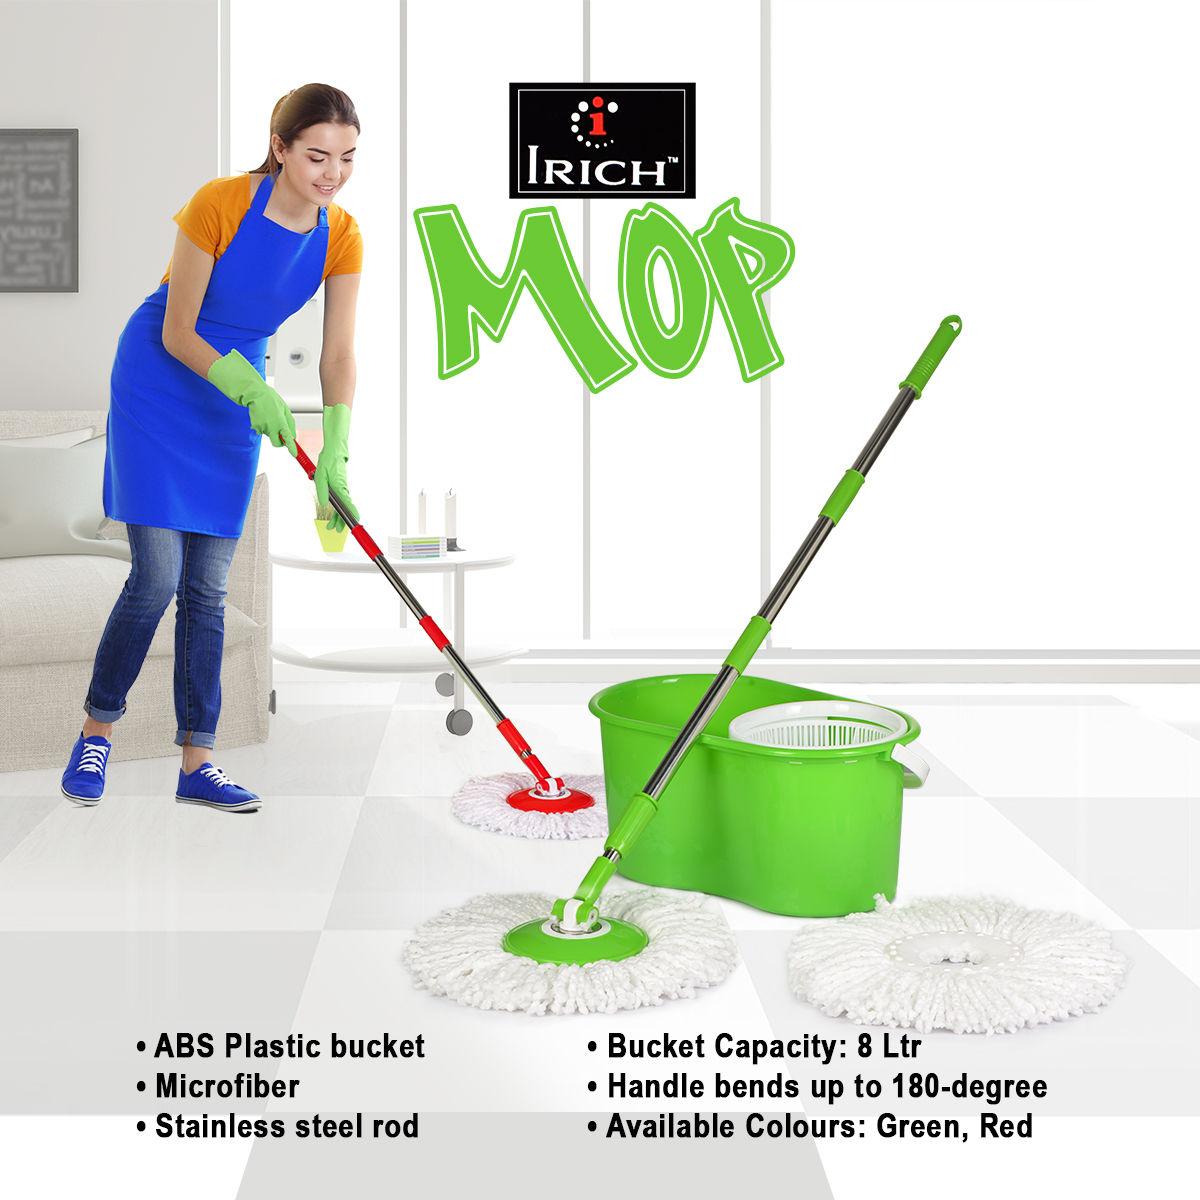 Buy Irich Mop Online at Best Price in India on Naaptol.com